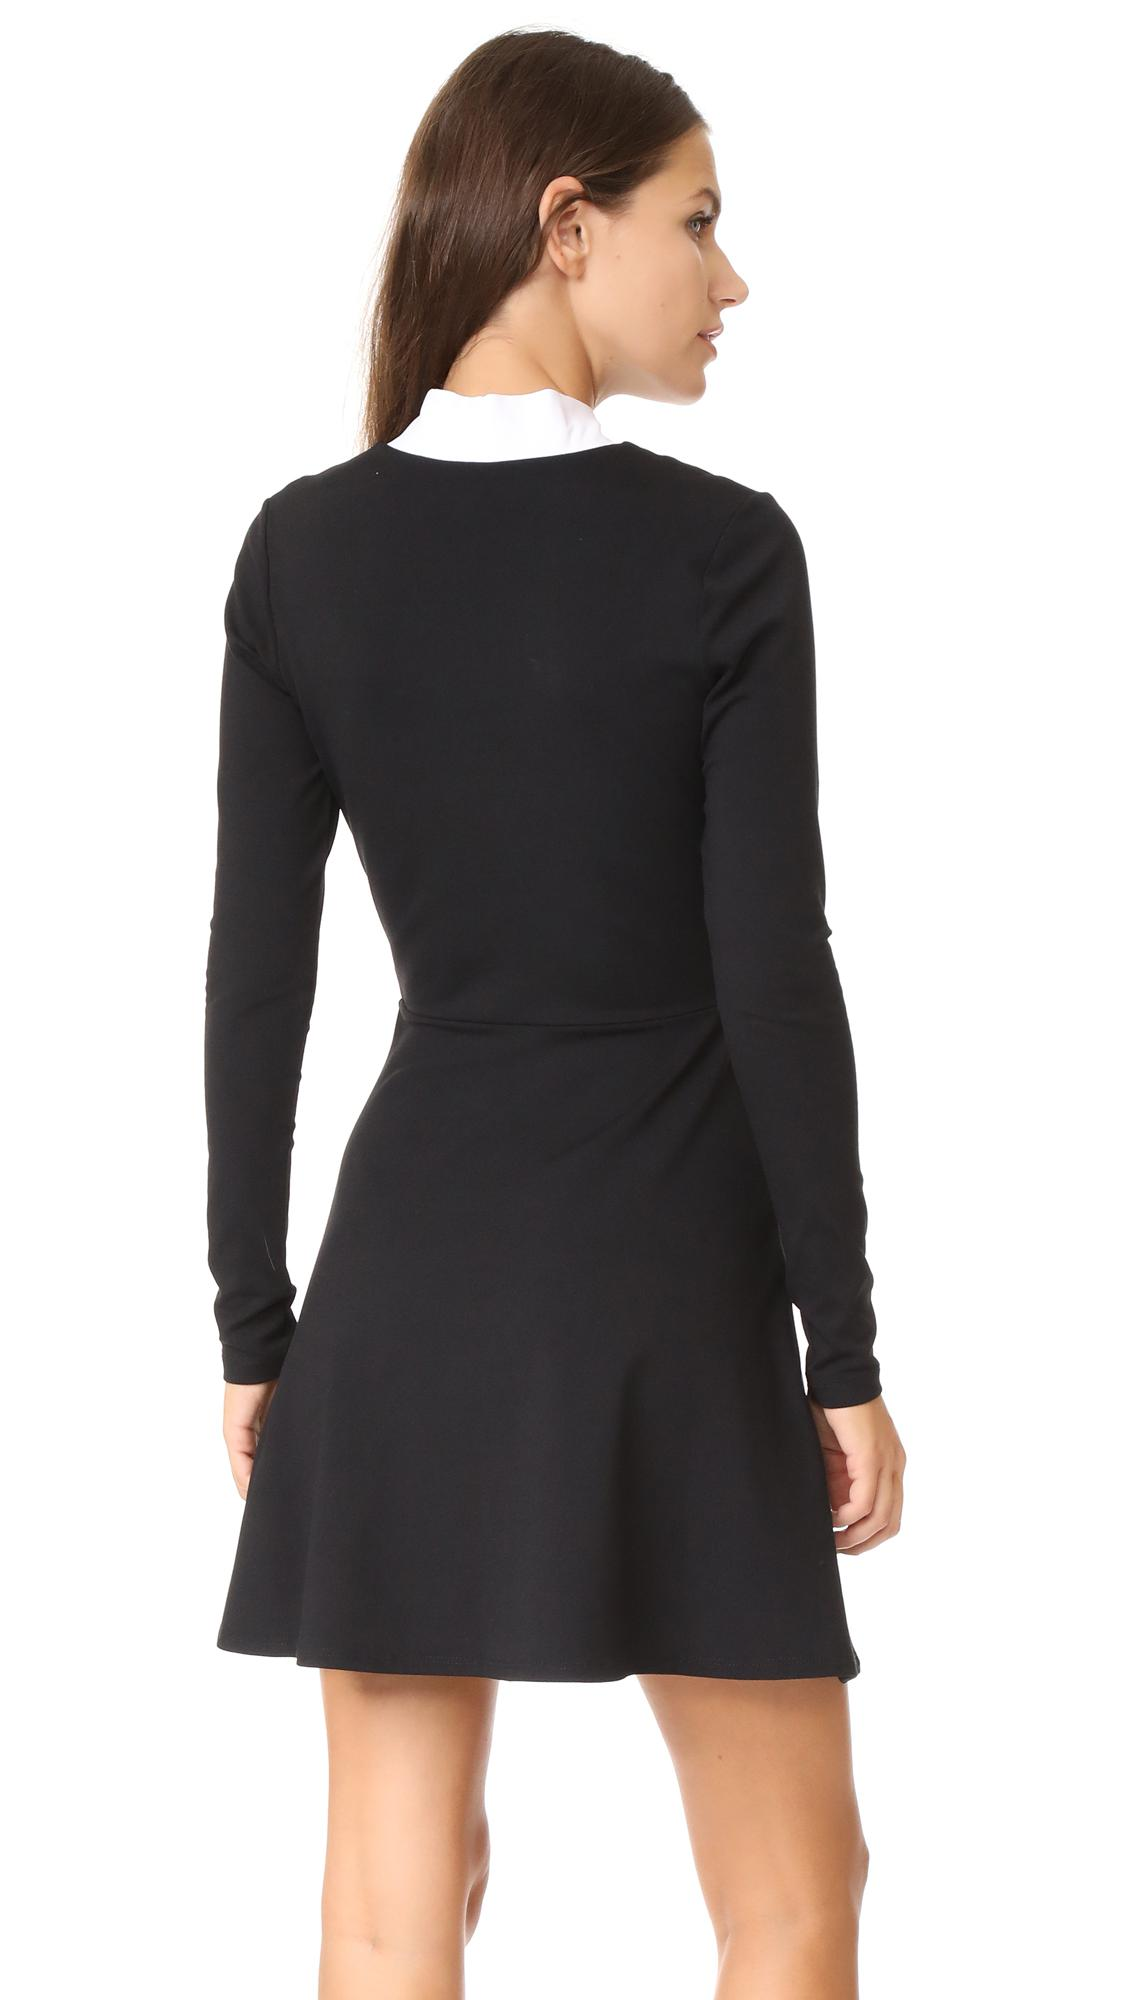 d96b7ae1a6 Susana Monaco - Black Neive Dress - Lyst. View fullscreen